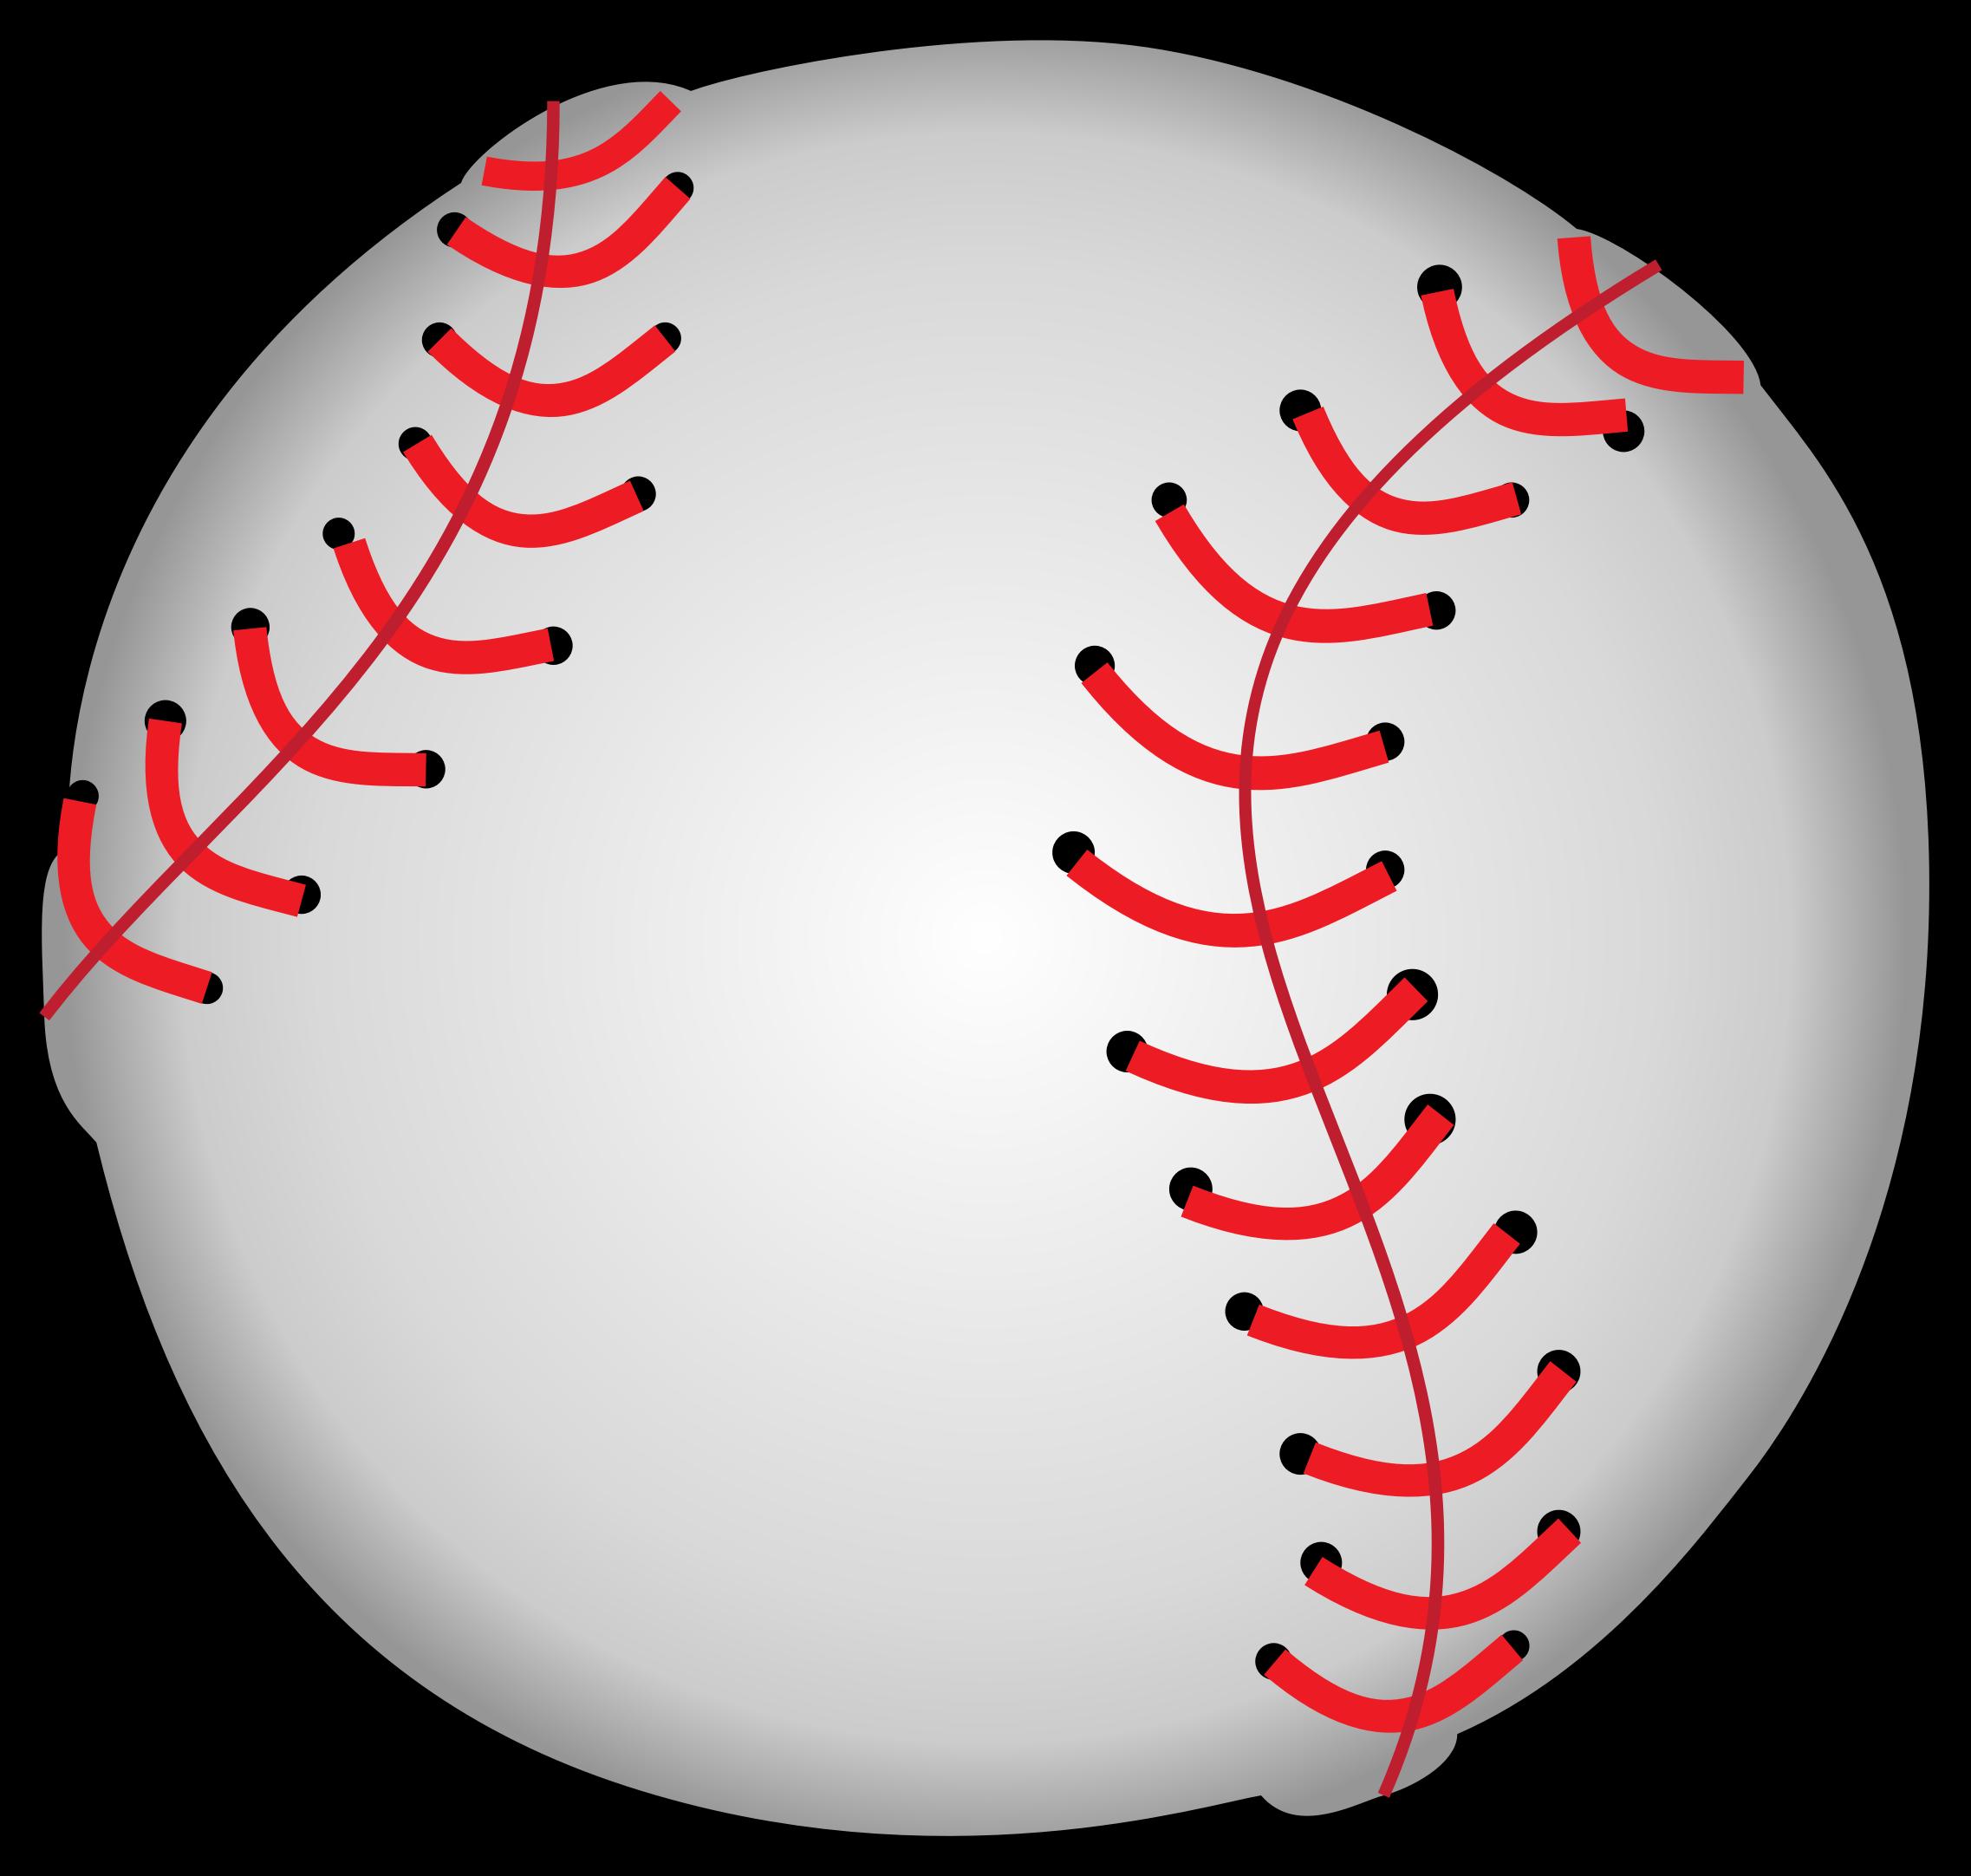 clip royalty free download Clipart big image png. Baseball clip high resolution